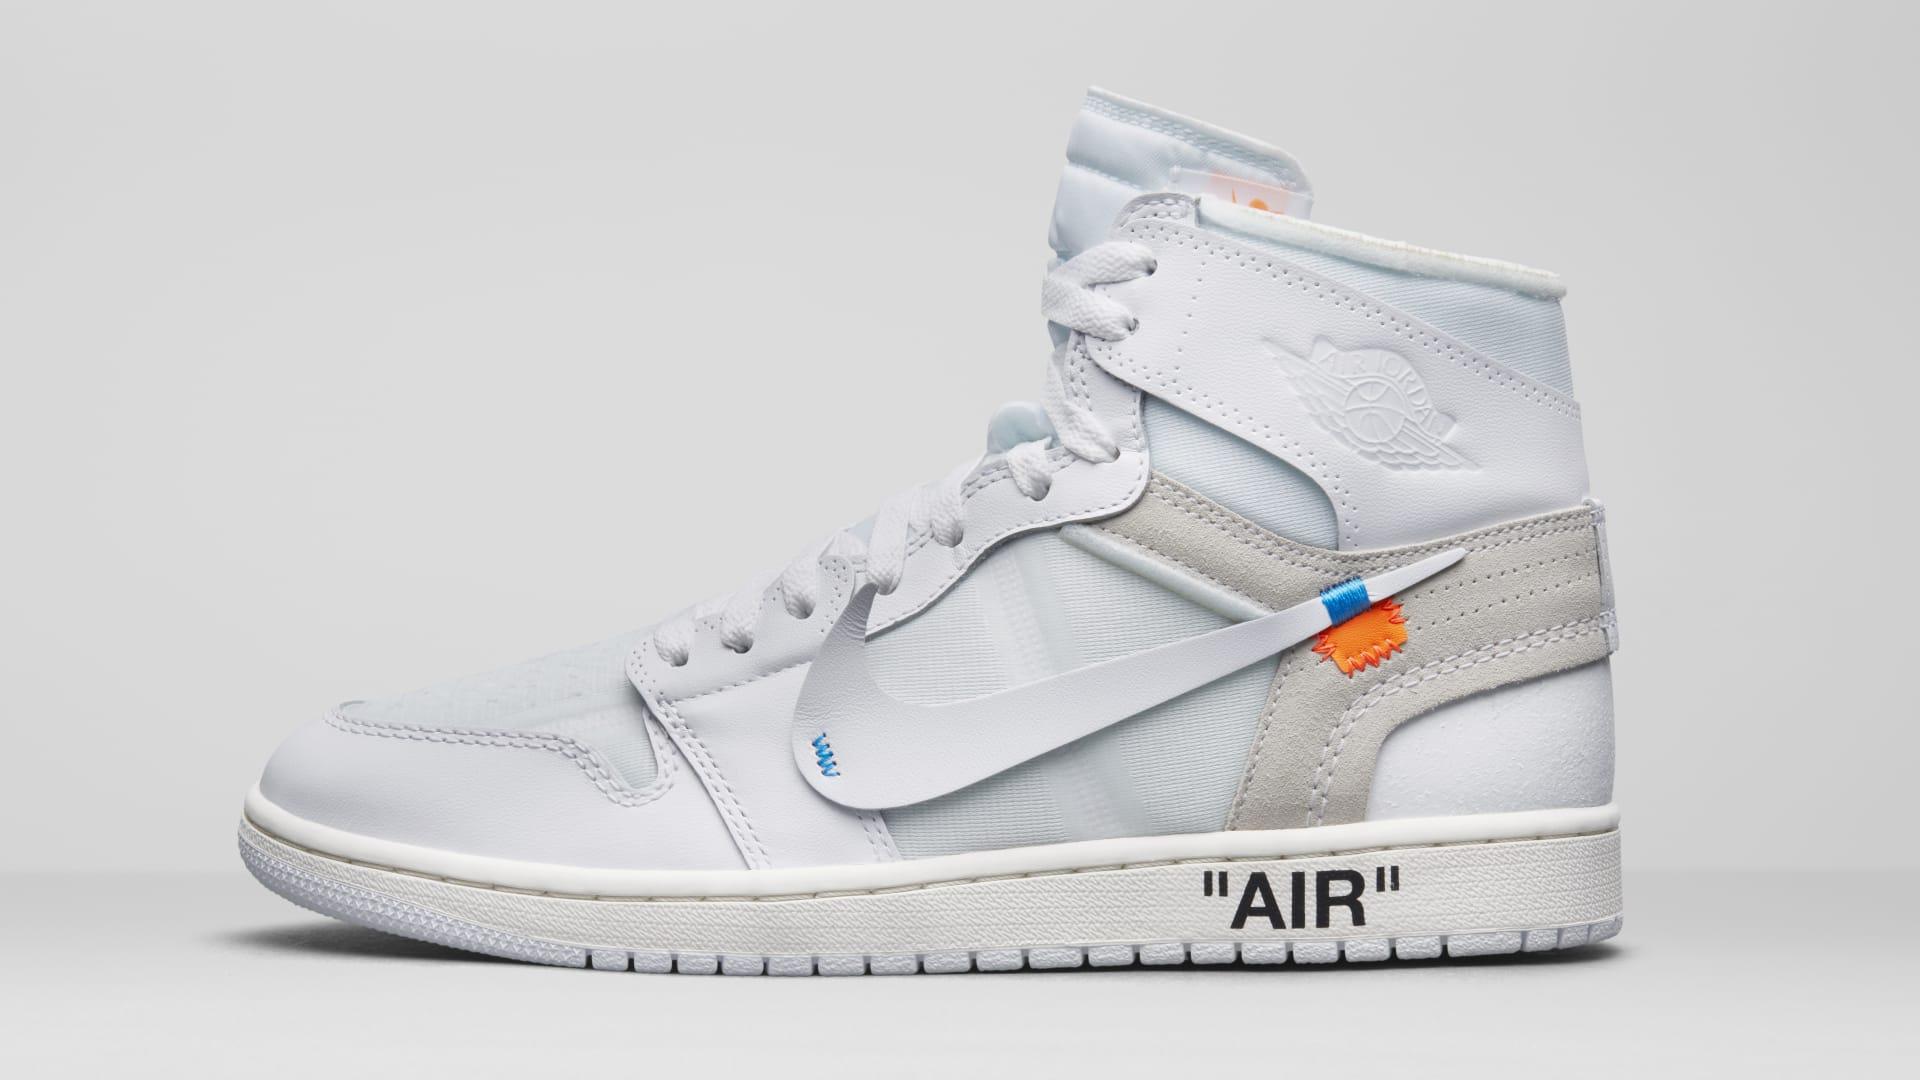 reputable site 024fa 480cf The Best Air Jordans of 2018 | Complex